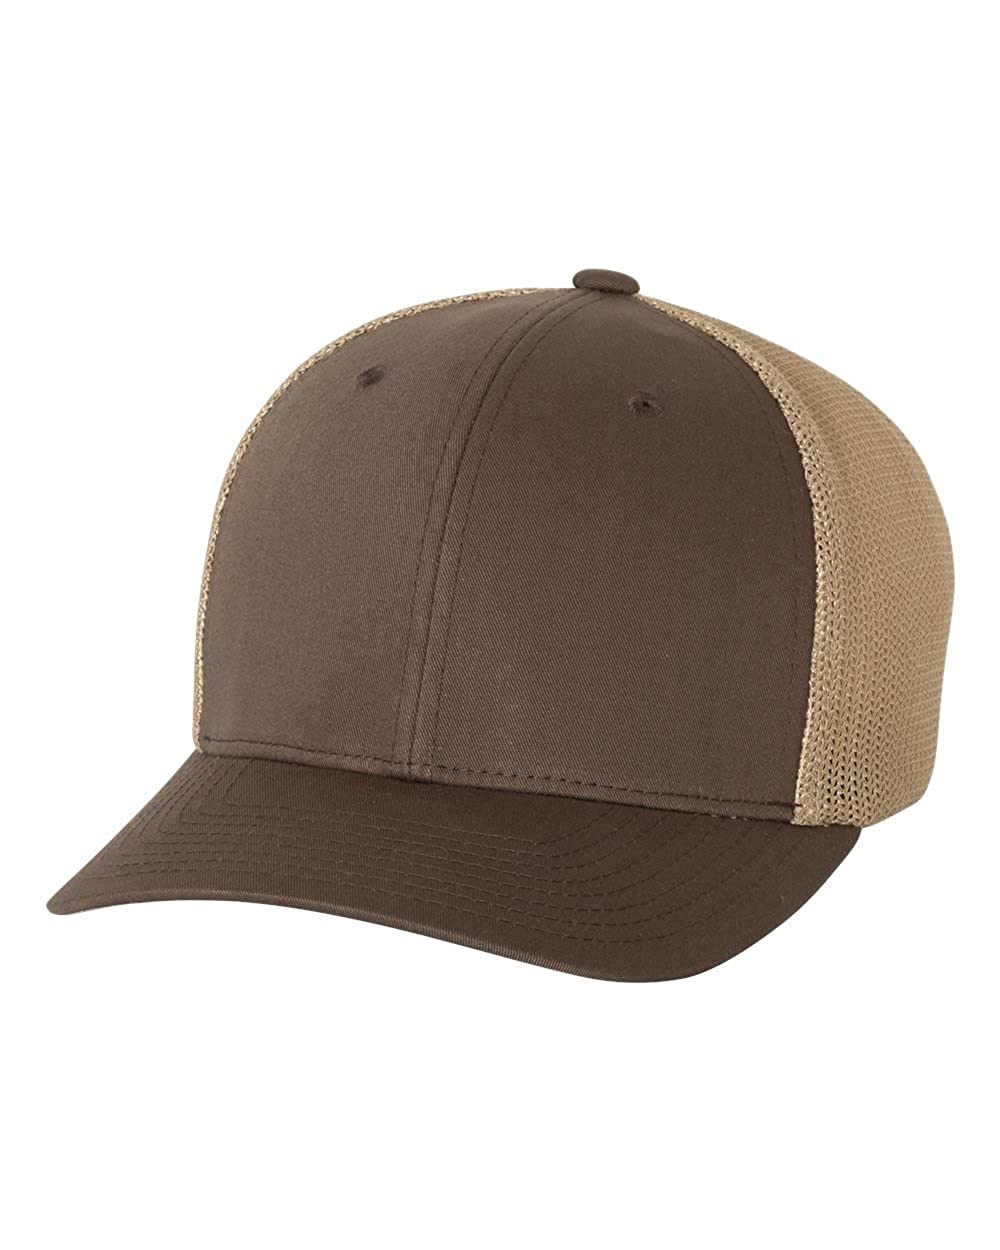 39877842b8f Flexfit Yupoong 6-Panel Trucker Baseball Cap 6511 (Brown Khaki) at Amazon  Men s Clothing store